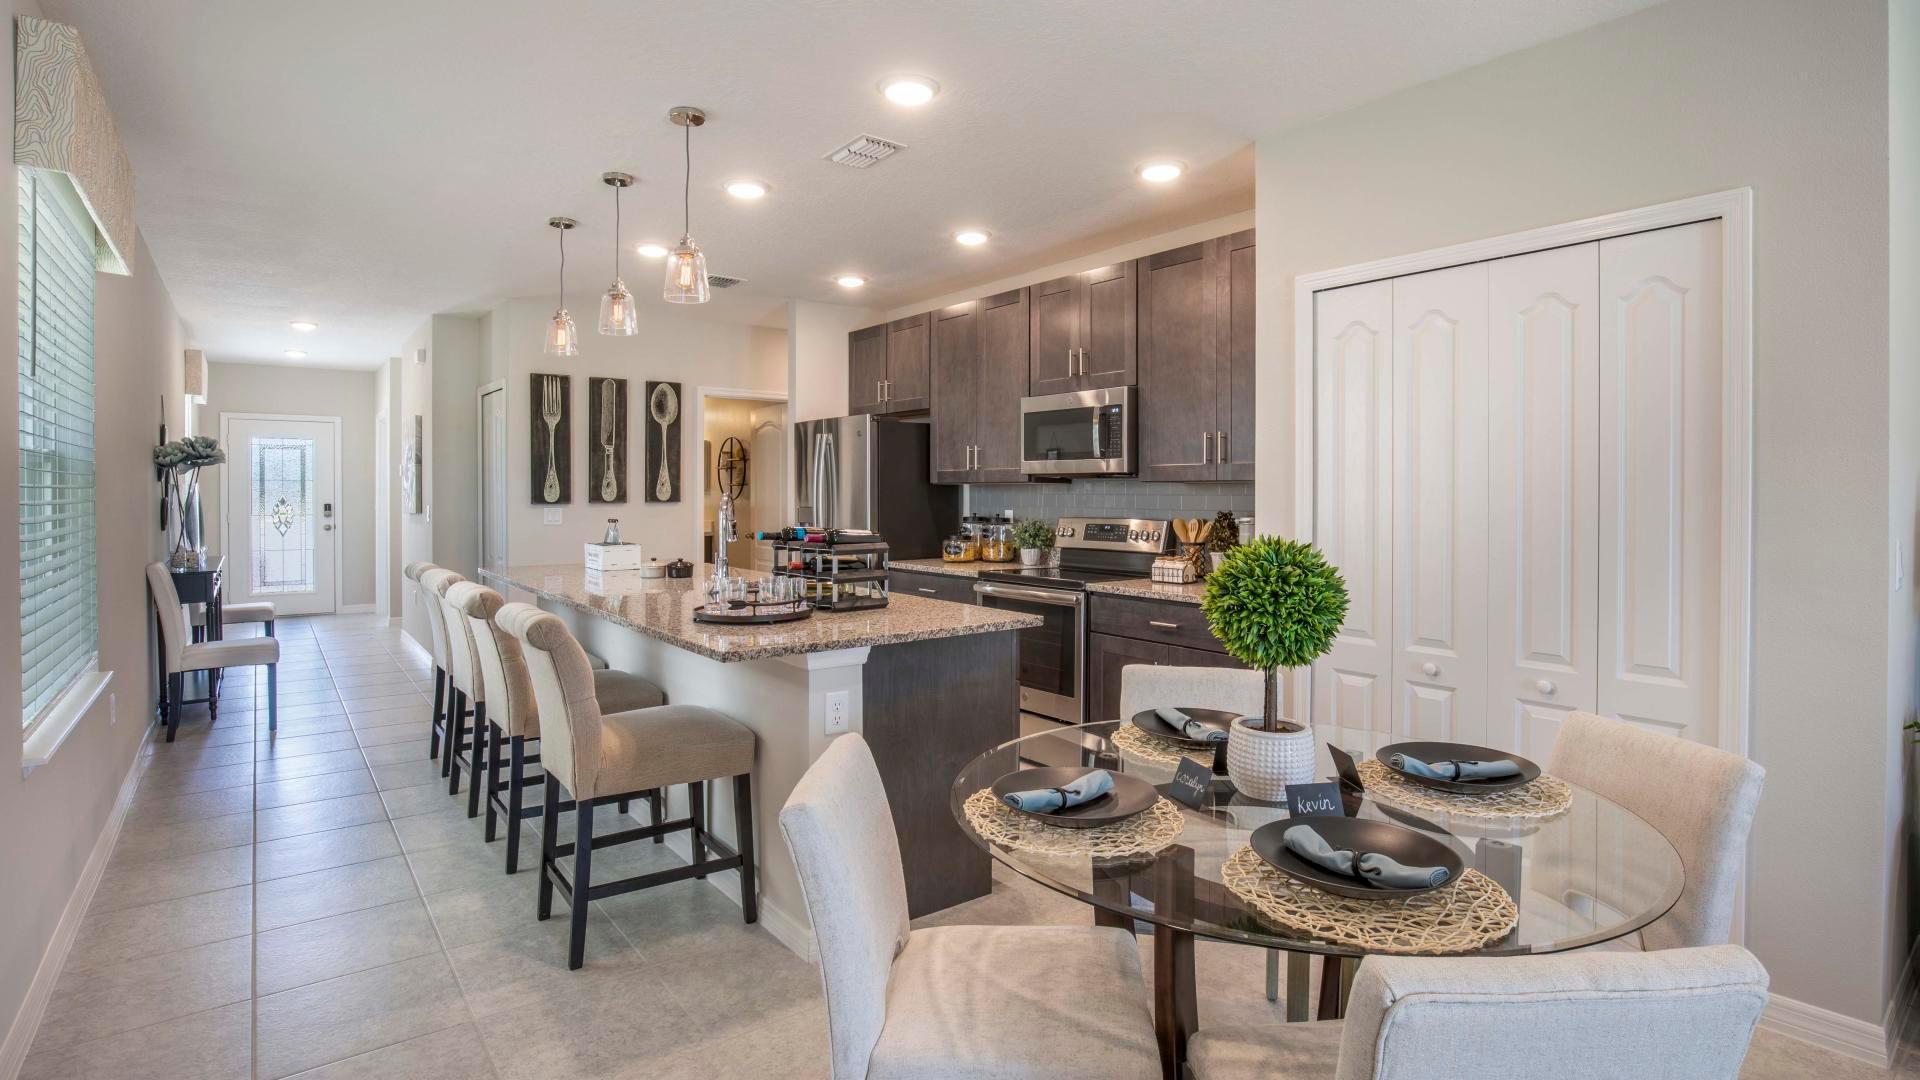 Kitchen featured in the Victoria By Maronda Homes in Daytona Beach, FL